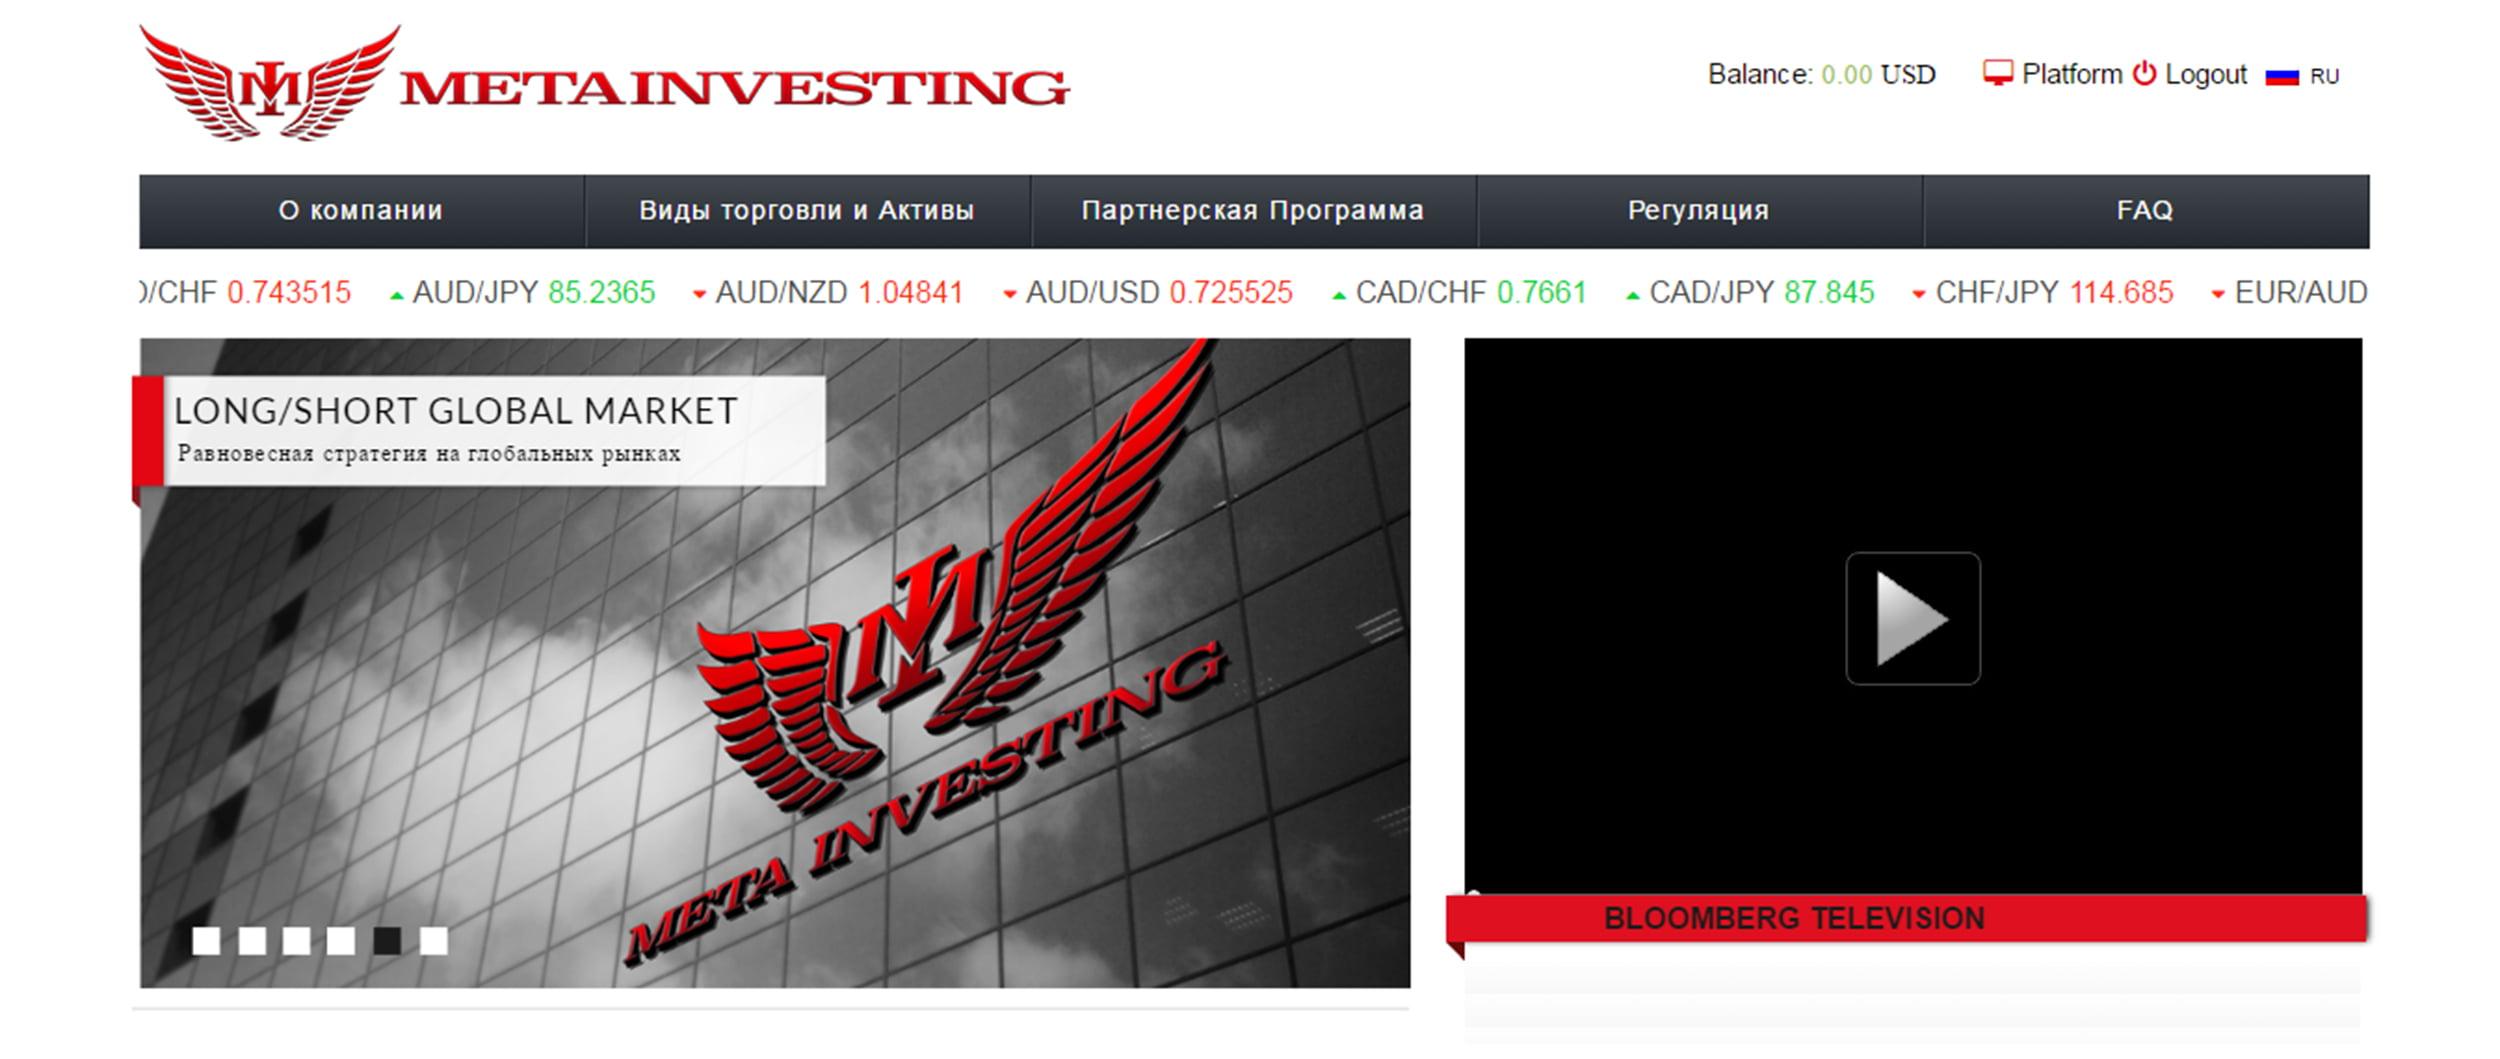 Сайт компании: http://www.metainvesting.com